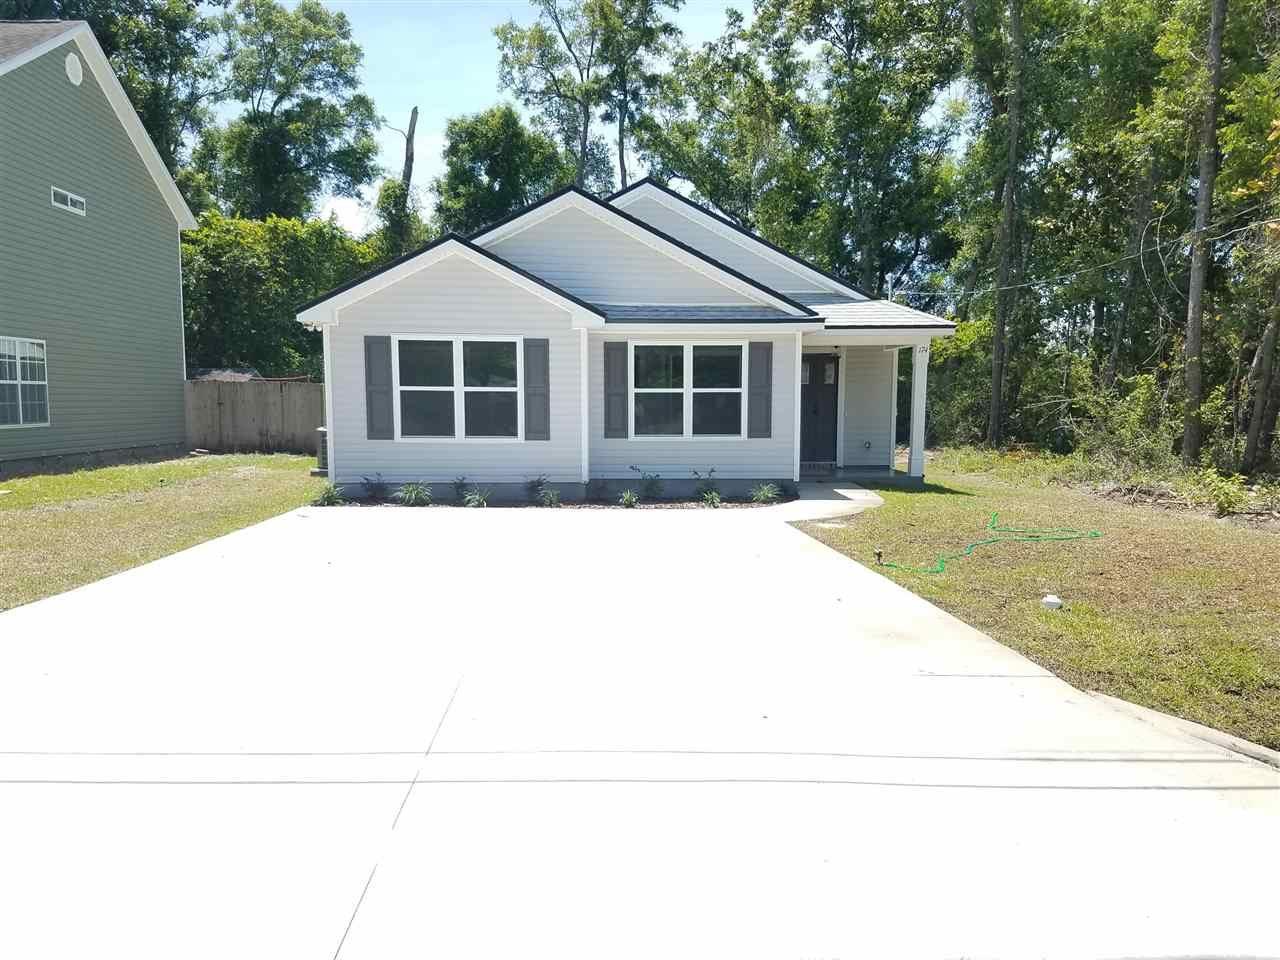 Lot 125 Tafflinger Road, Crawfordville, FL 32327 - MLS#: 326480